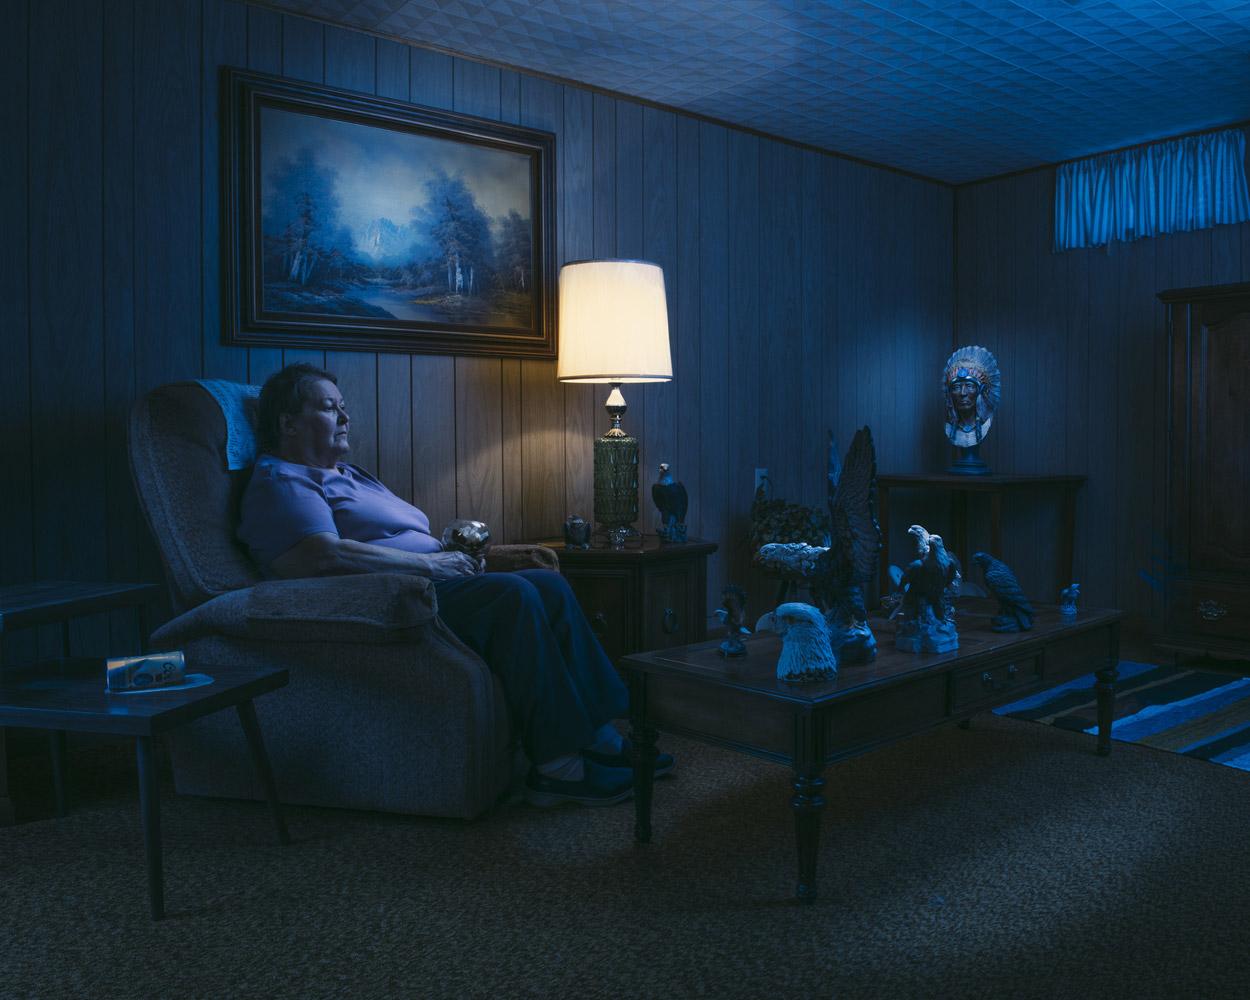 Джастин Листер / Justin Lister, США, 3-е место в категории «Три и более света», Фотоконкурс «Видение света» / Seeing the Light